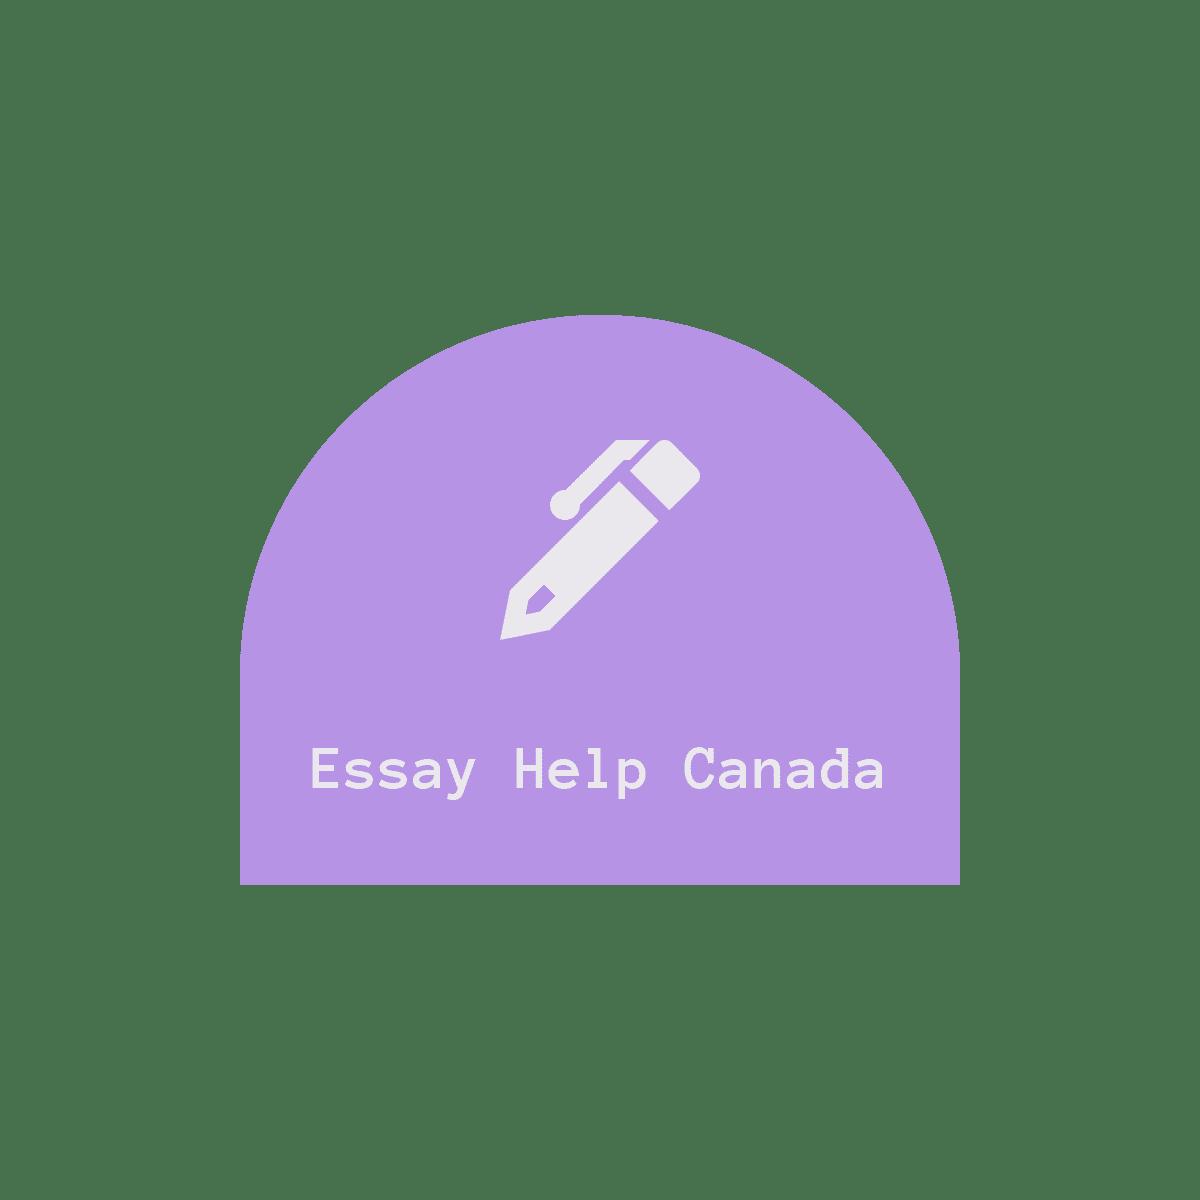 Essay Help Canada